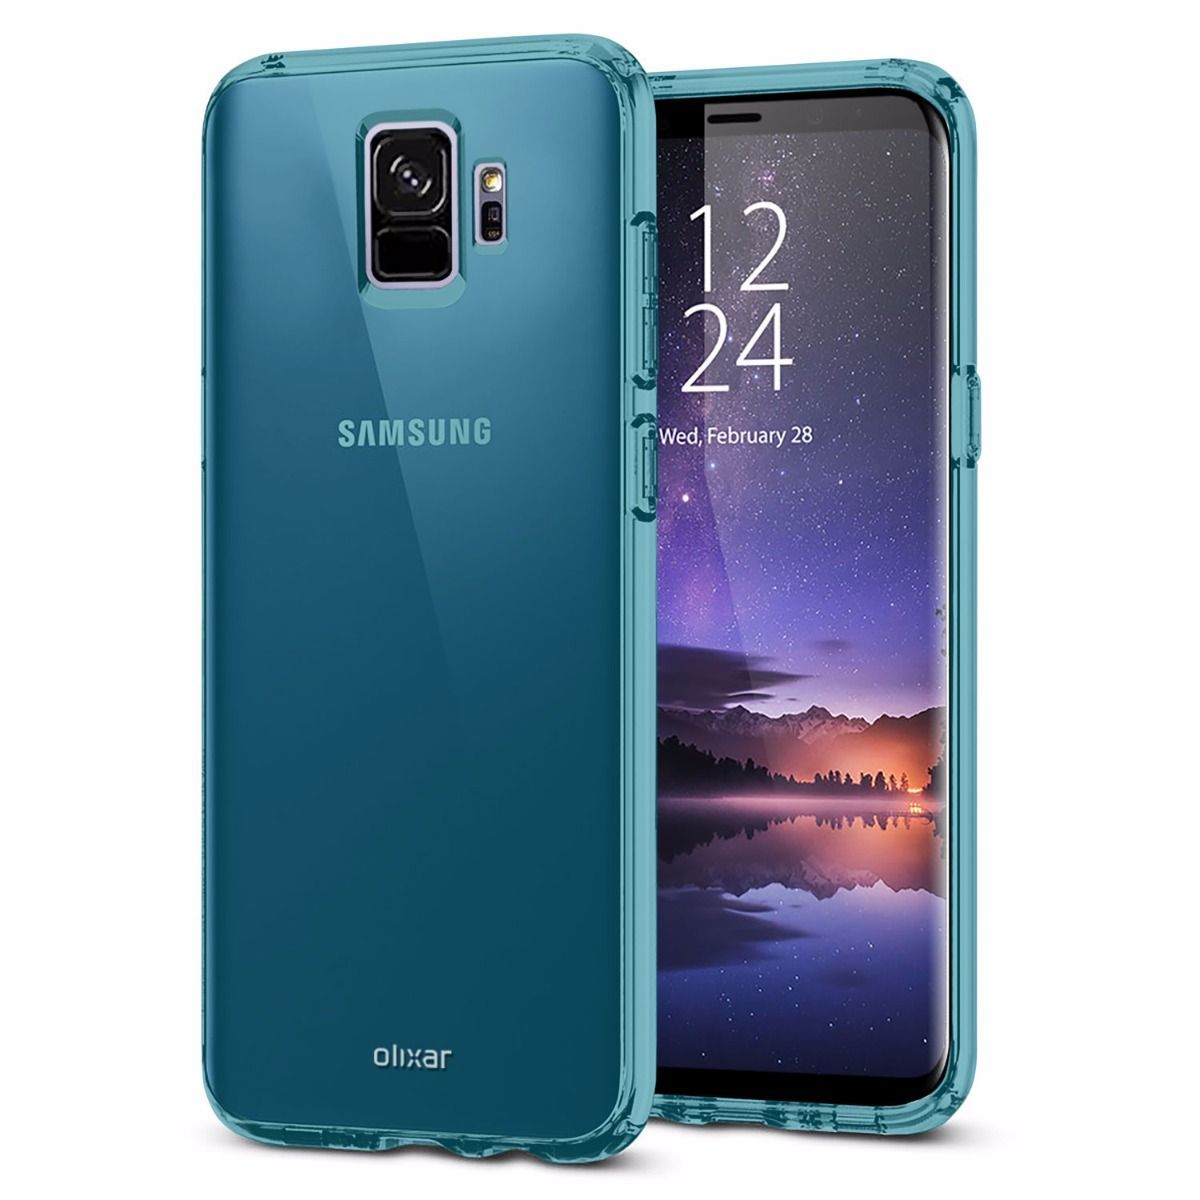 https://i-cdn.phonearena.com/images/articles/317335-image/Olixar-FlexiShield-Gel-Case-for-the-Galaxy-S9S9.jpg